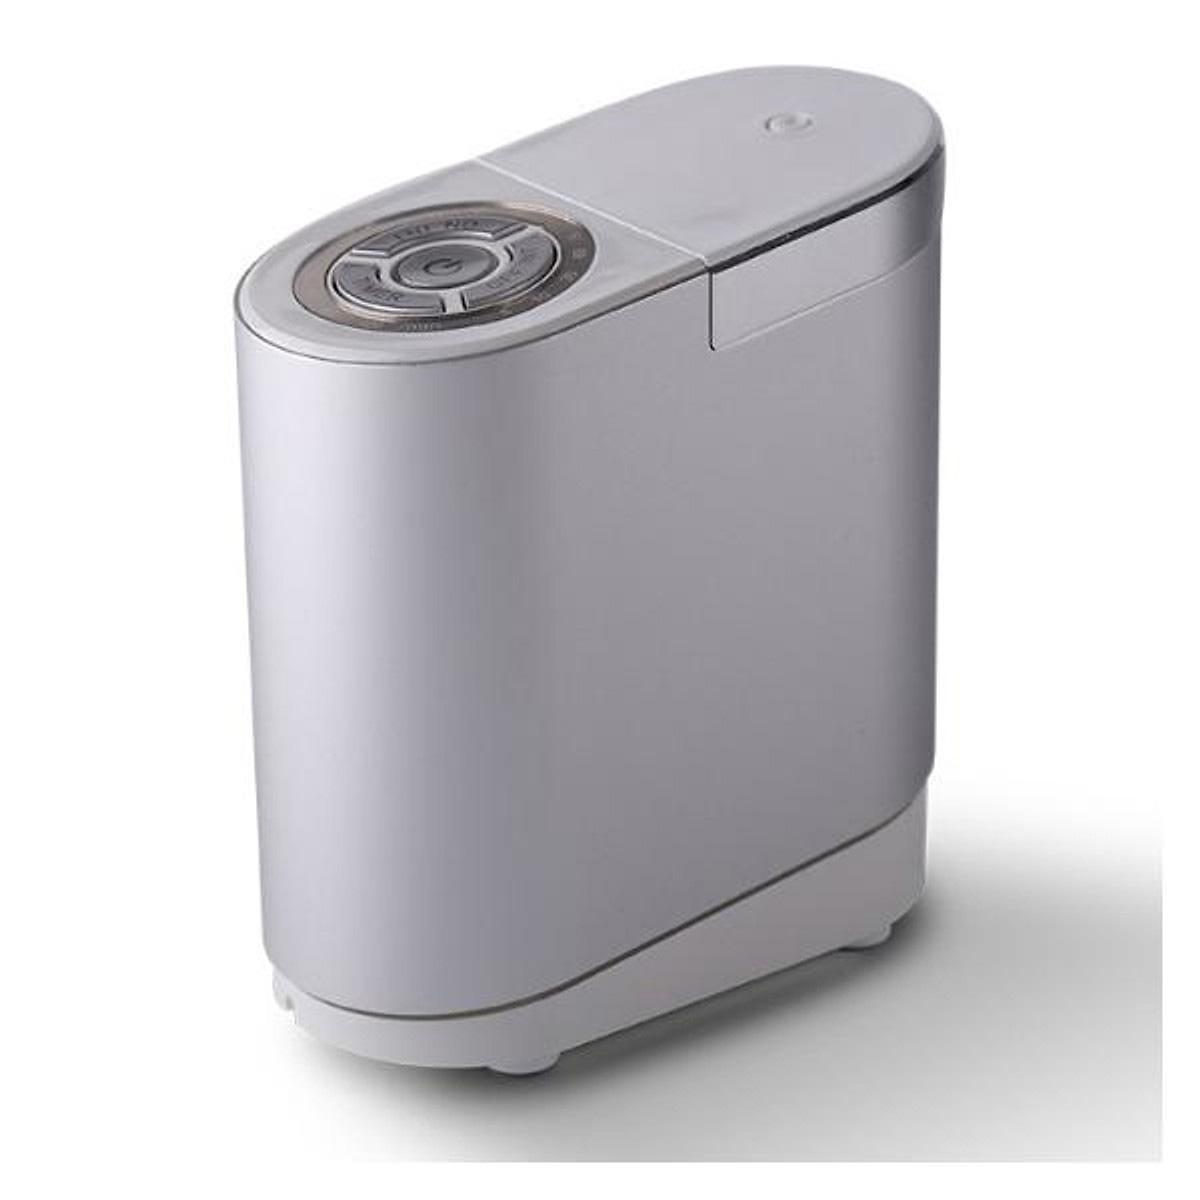 máy khuếch tán tinh dầu